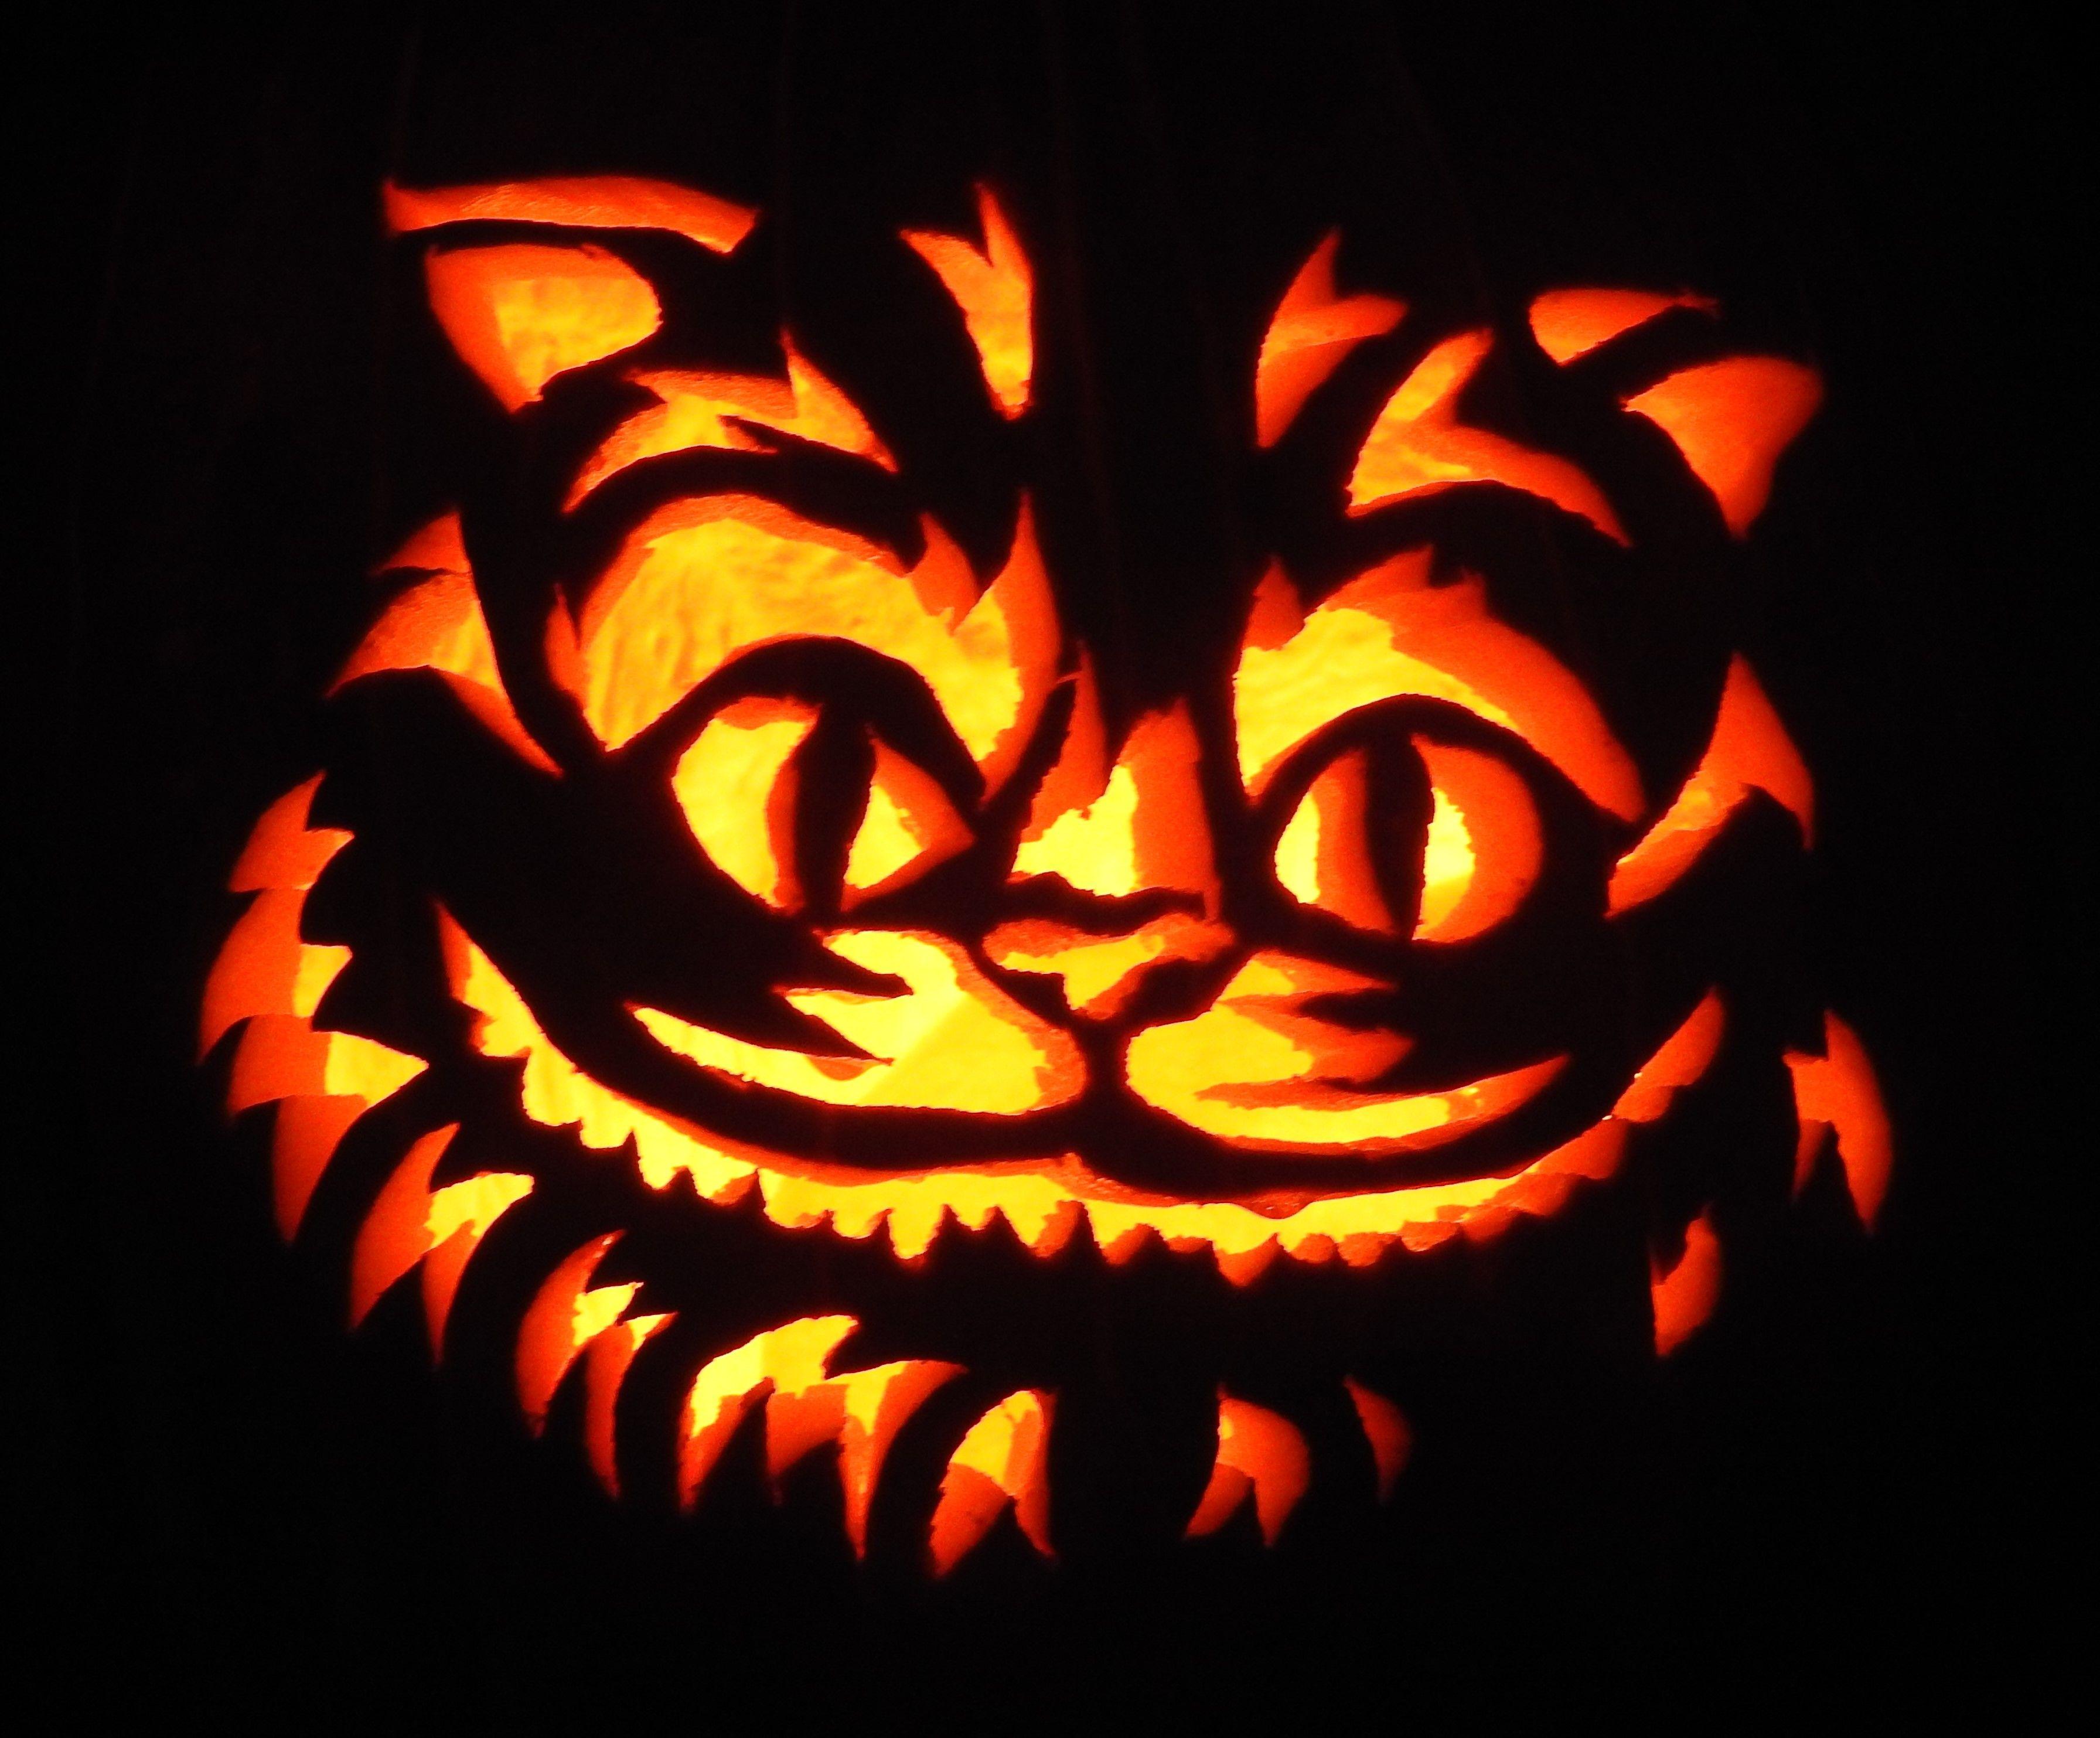 Cheshire Cat Pumpkin Carving And Pumpkin Patterns